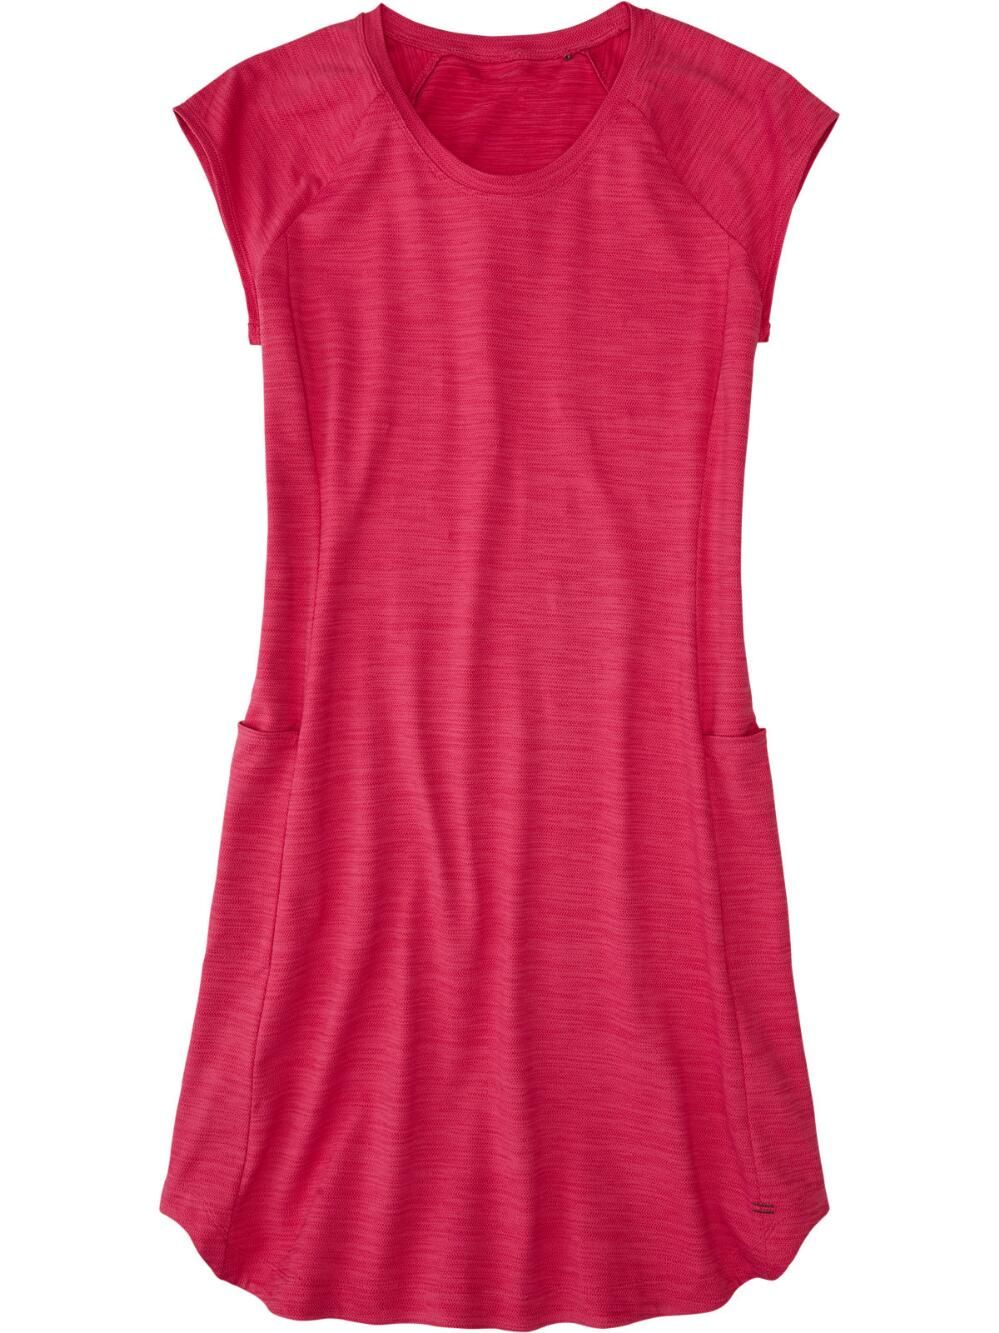 91e331af0e8a Tomboy Short Sleeve T Shirt Dress With Pockets | Title Nine | style ...